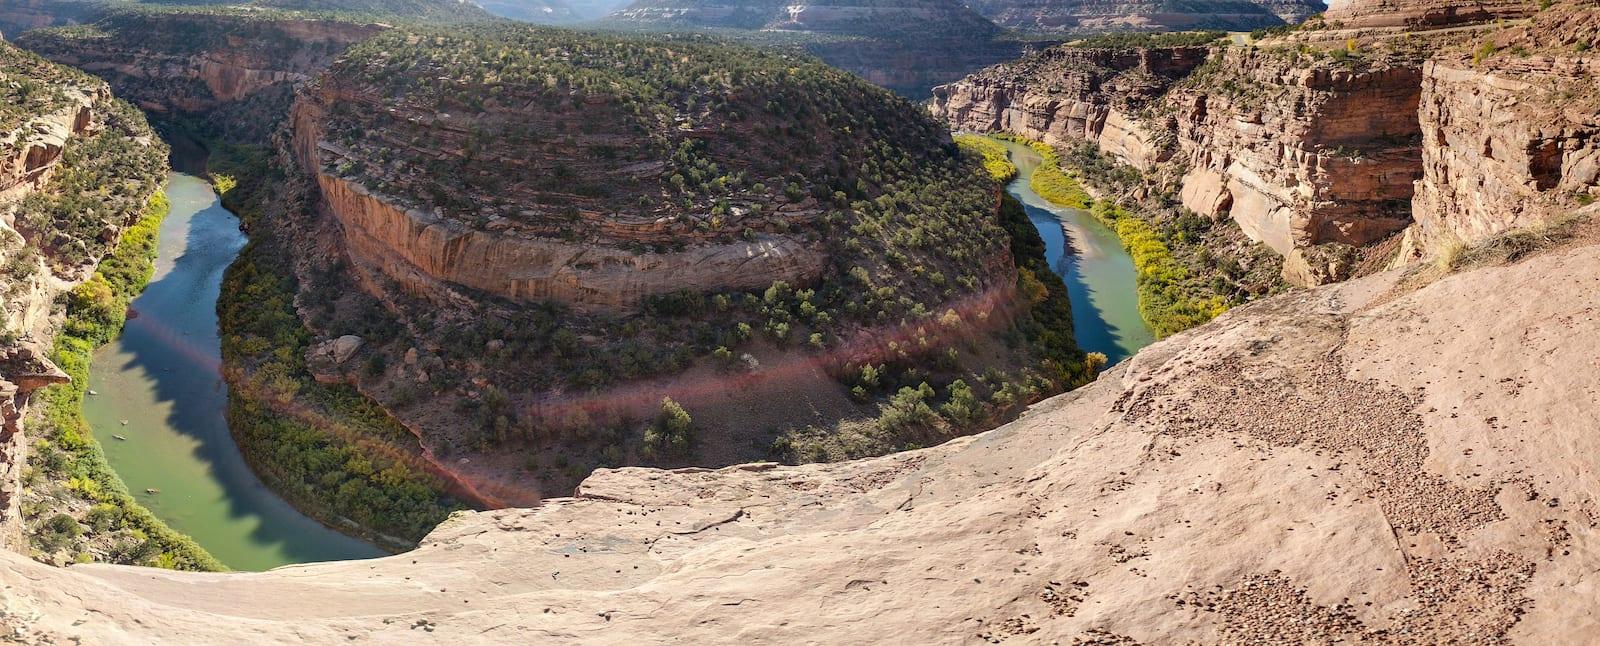 Dolores River Canyon near Uravan, Colorado